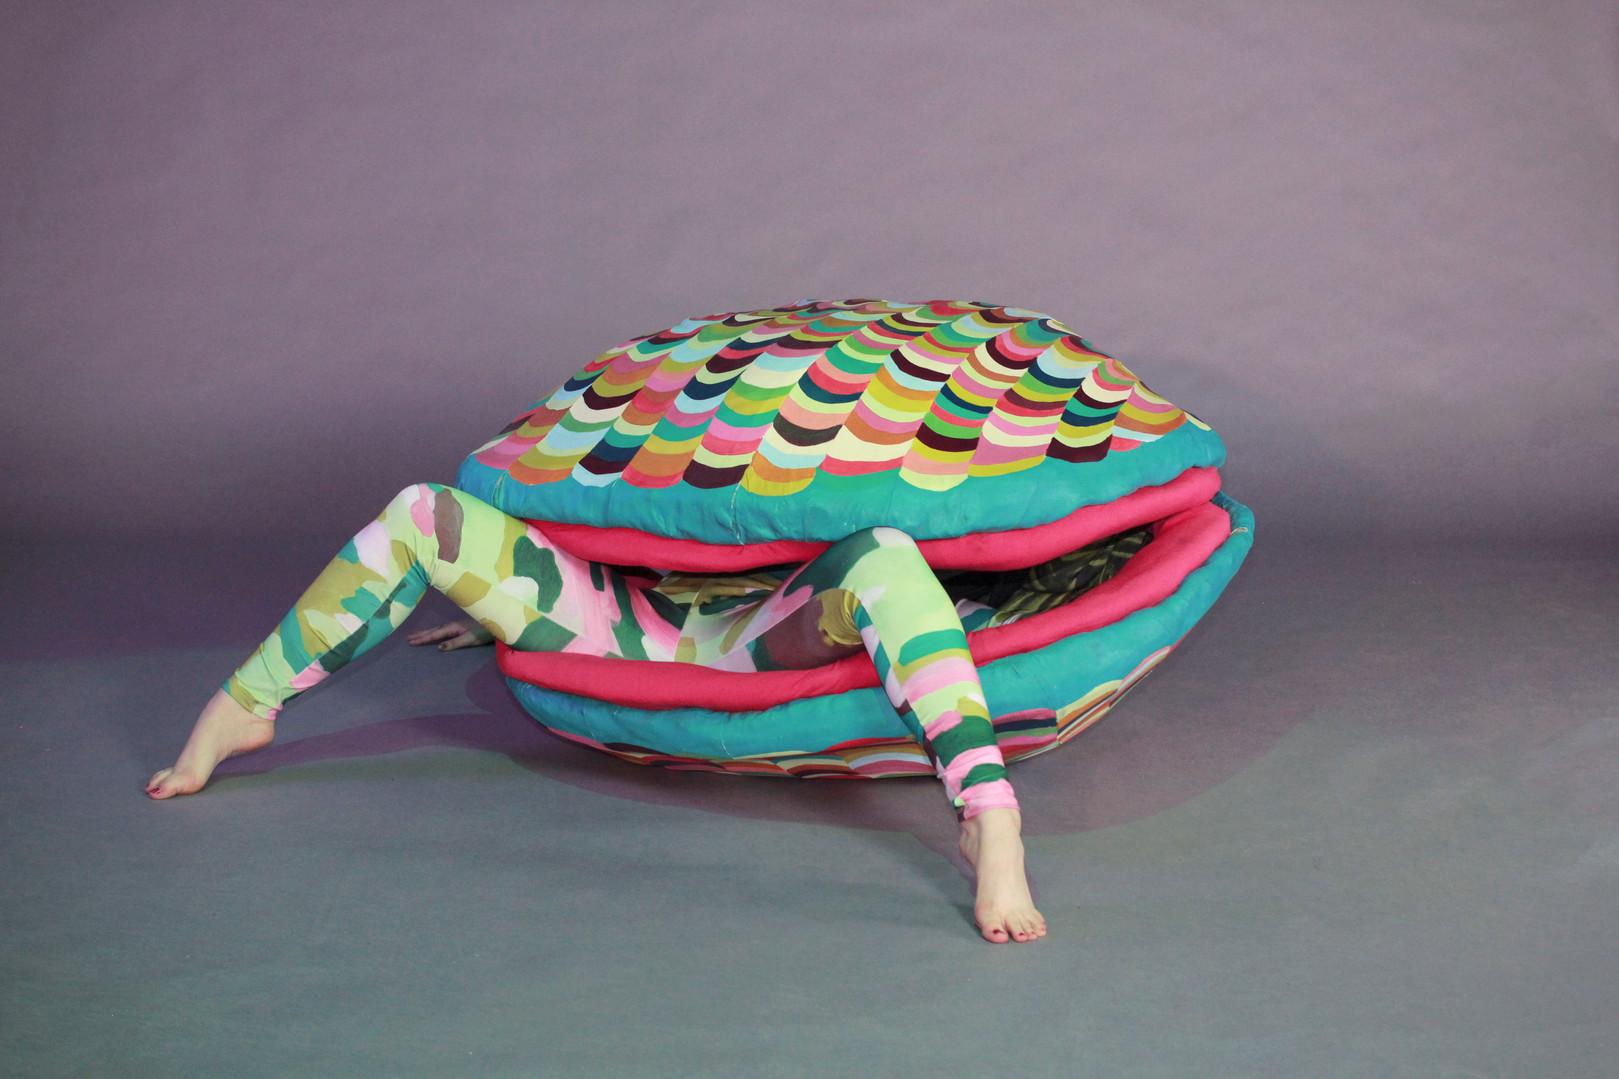 1 flan clam 3.jpg